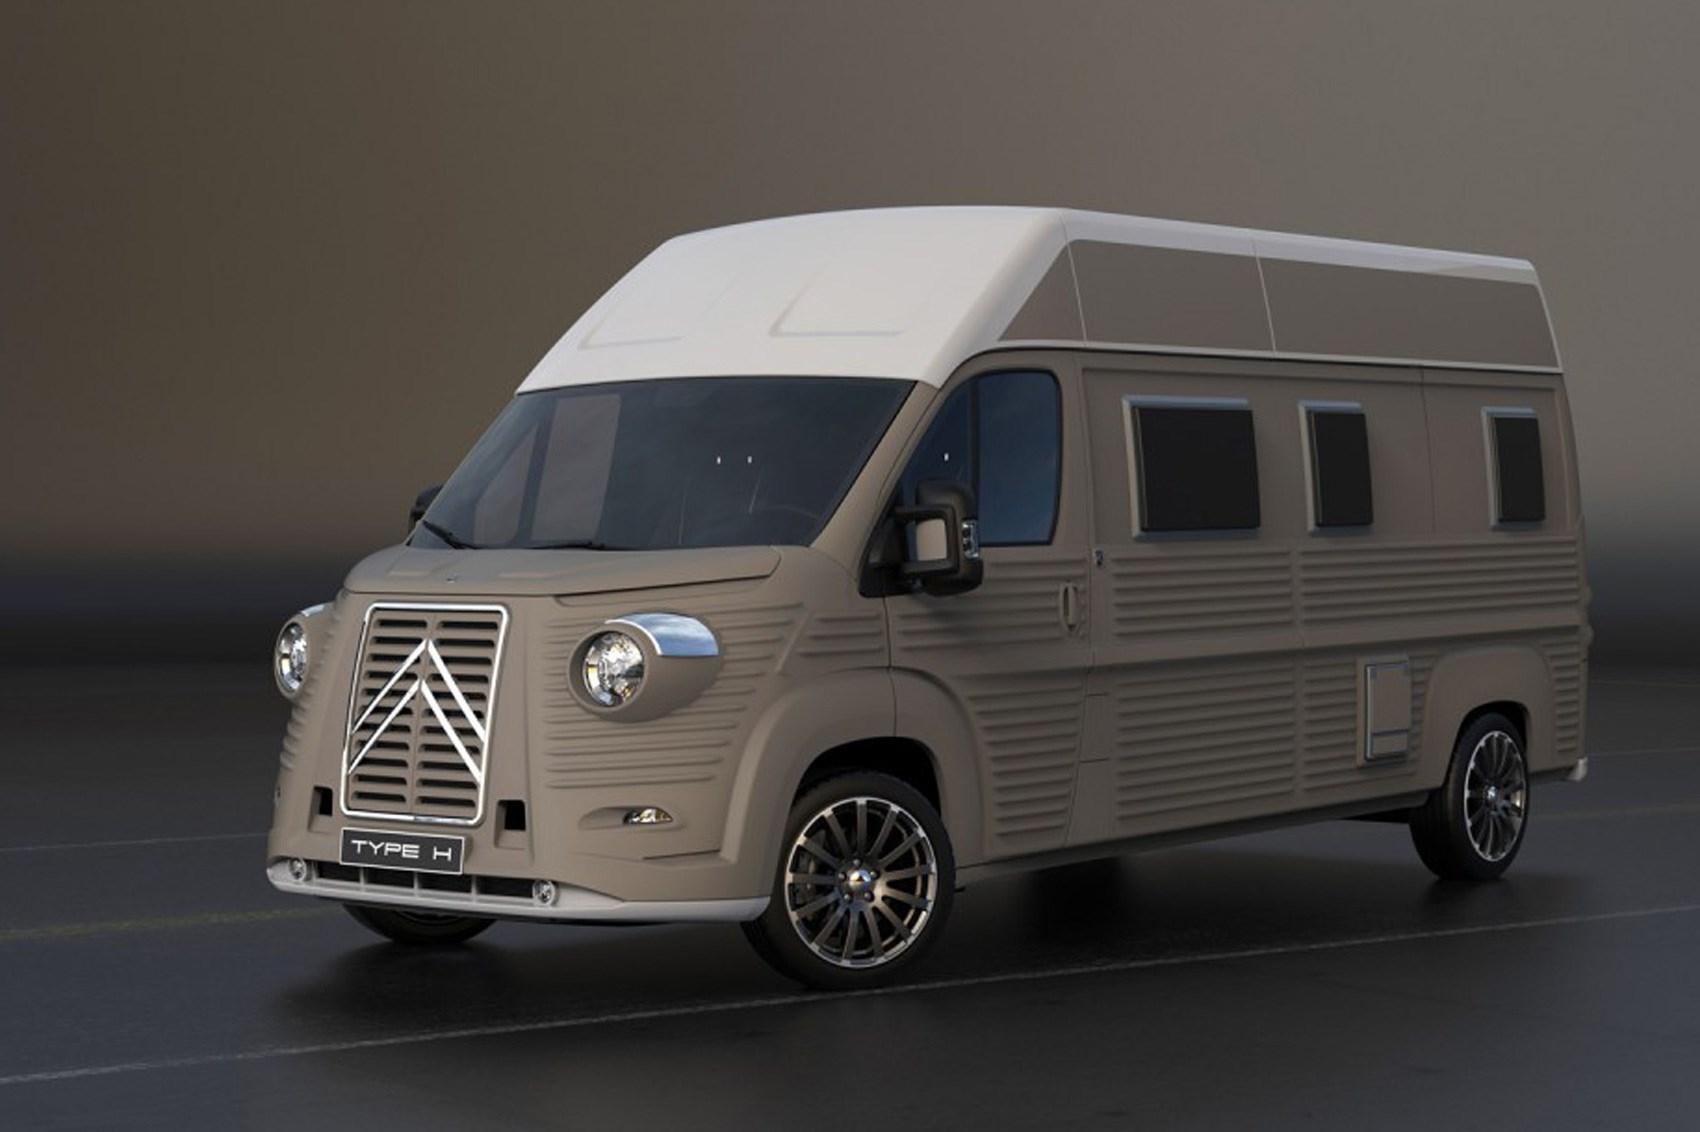 Citroen Relay Transformed Into Retrotastic H Van By Car